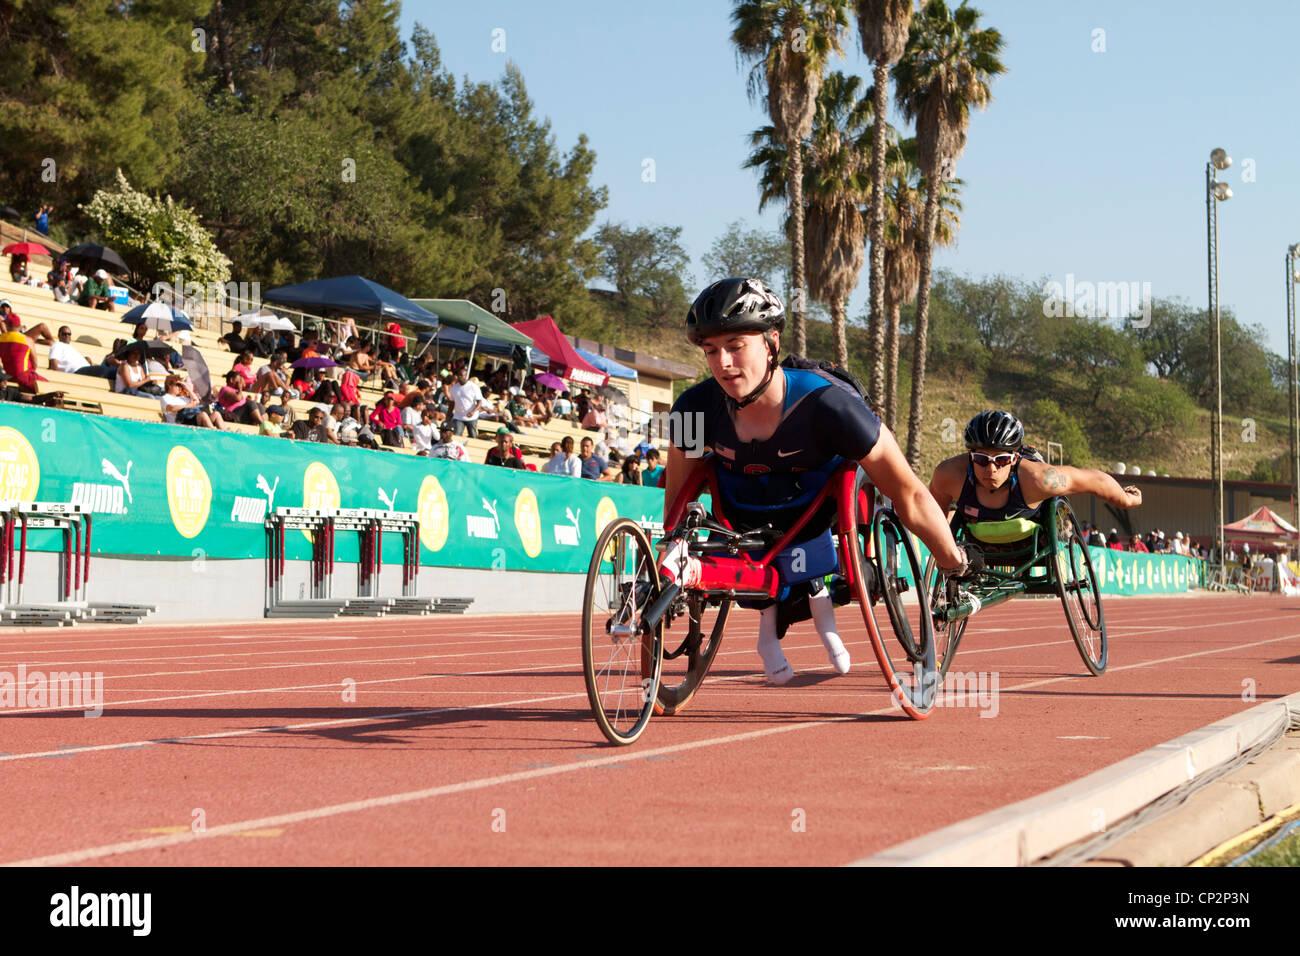 USA Mens 1500m wheelchair race At the Mt Sac relays 2012, Walnut, California, USA - Stock Image